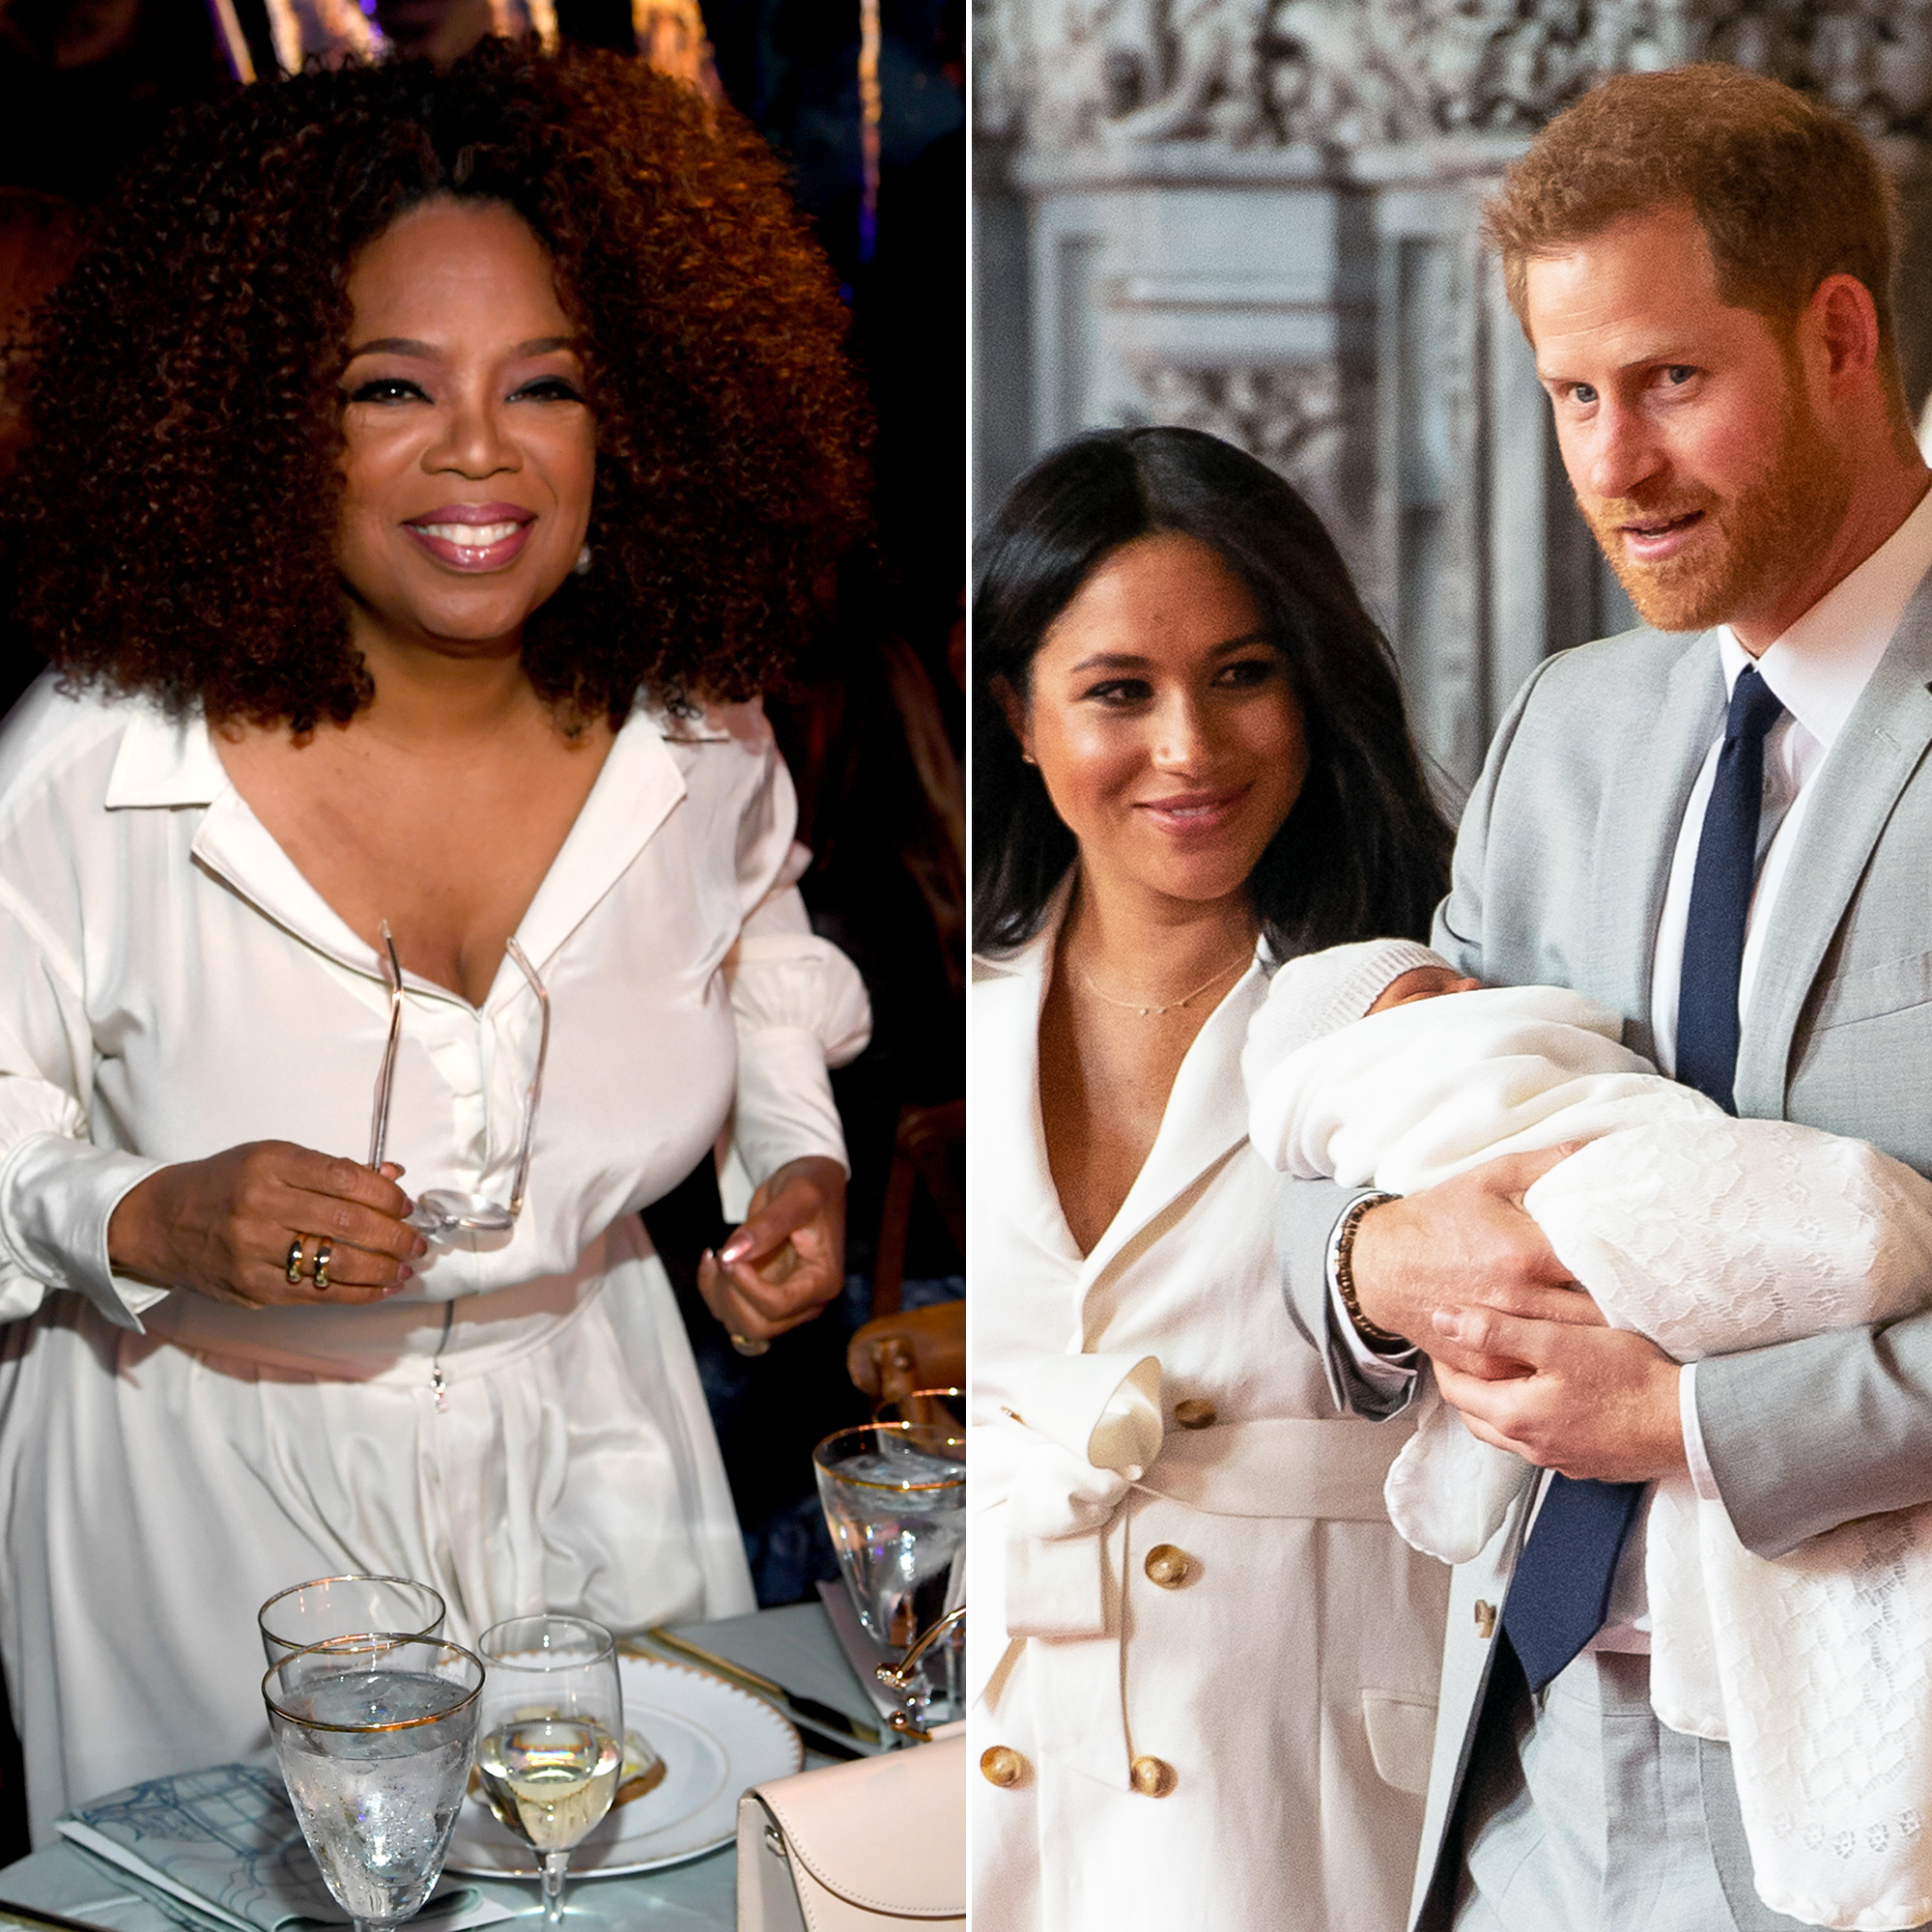 Oprah Winfrey Bought Present Prince Harry Duchess Meghan Royal Baby - Oprah Winfrey, Duchess Meghan, Duchess Harry and the new royal baby, Archie.